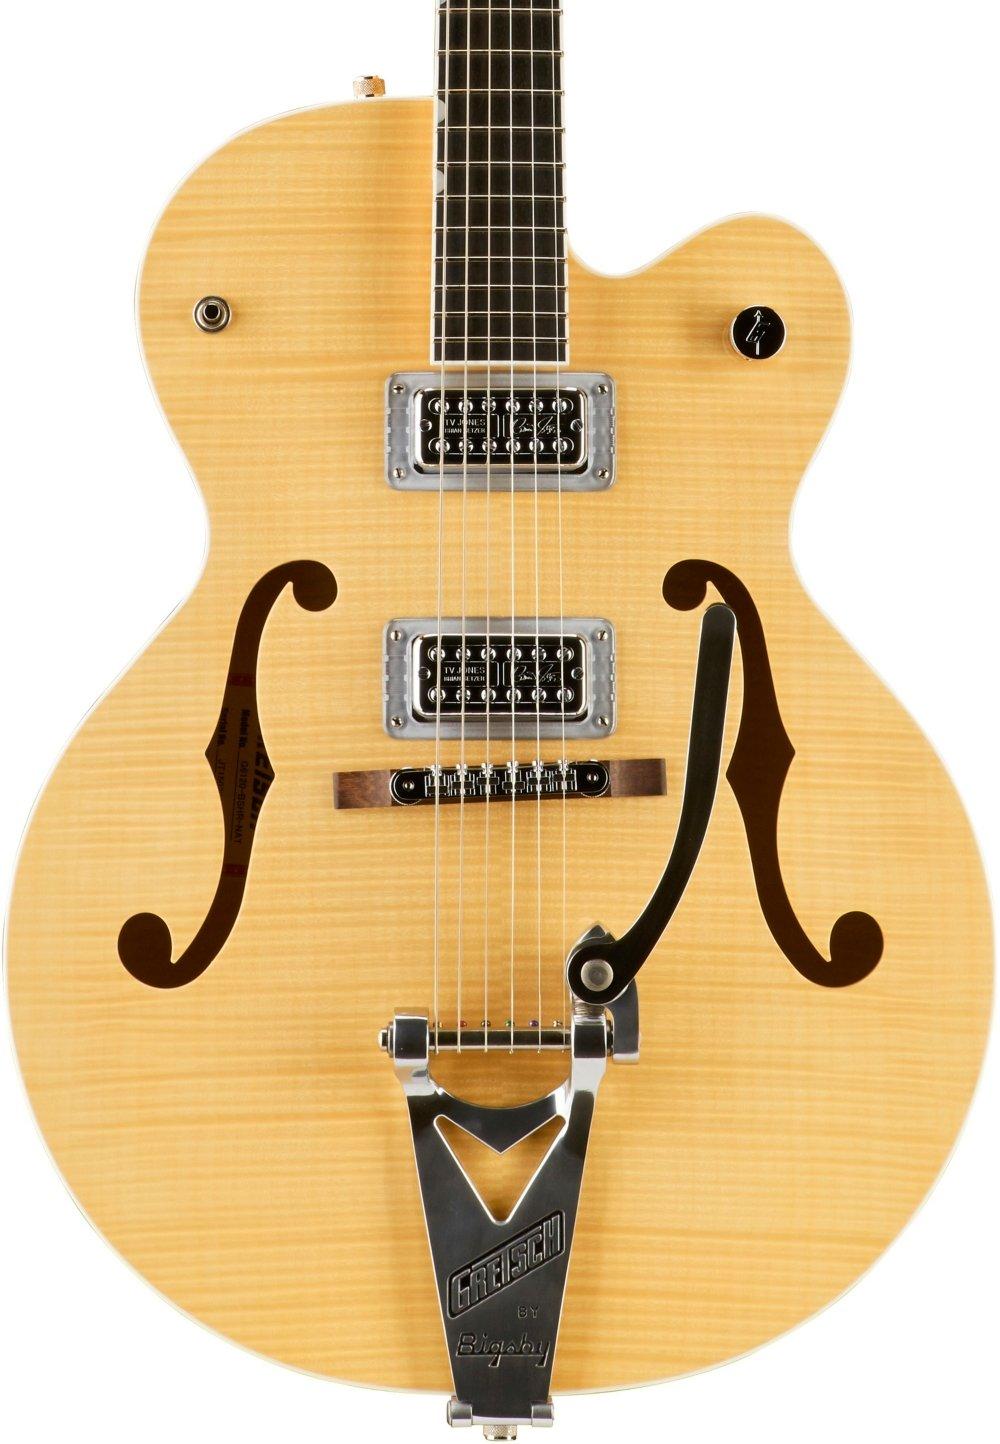 Cheap Gretsch Guitars G6120SH Brian Setzer Hot Rod Flame Maple Body Semi-Hollow Electric Guitar Blonde Black Friday & Cyber Monday 2019